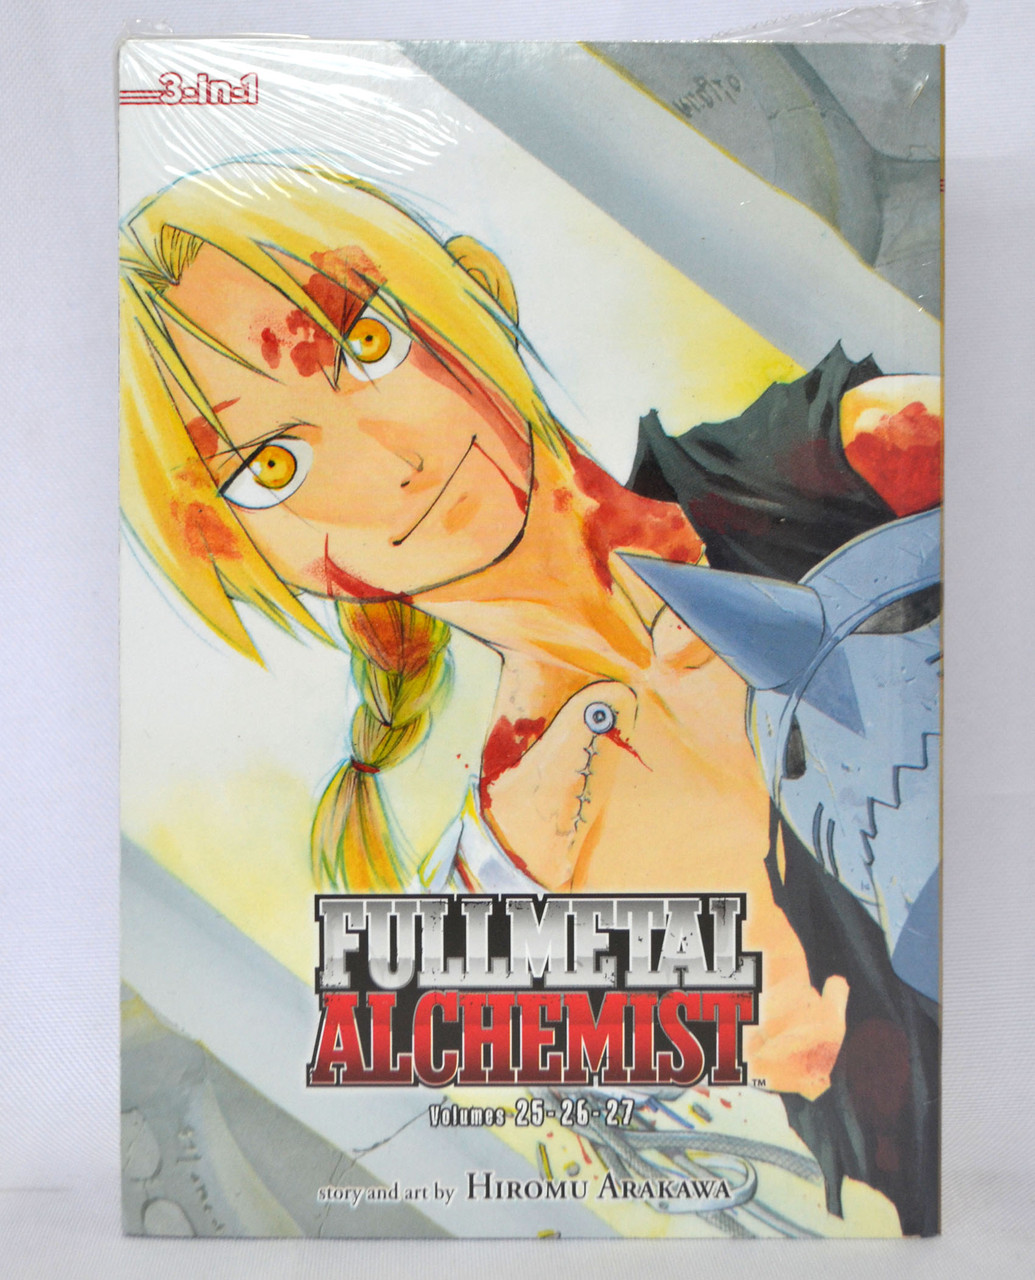 Manga Fullmetal Alchemist (3-in-1 Edition), Vol. 9 (English language)